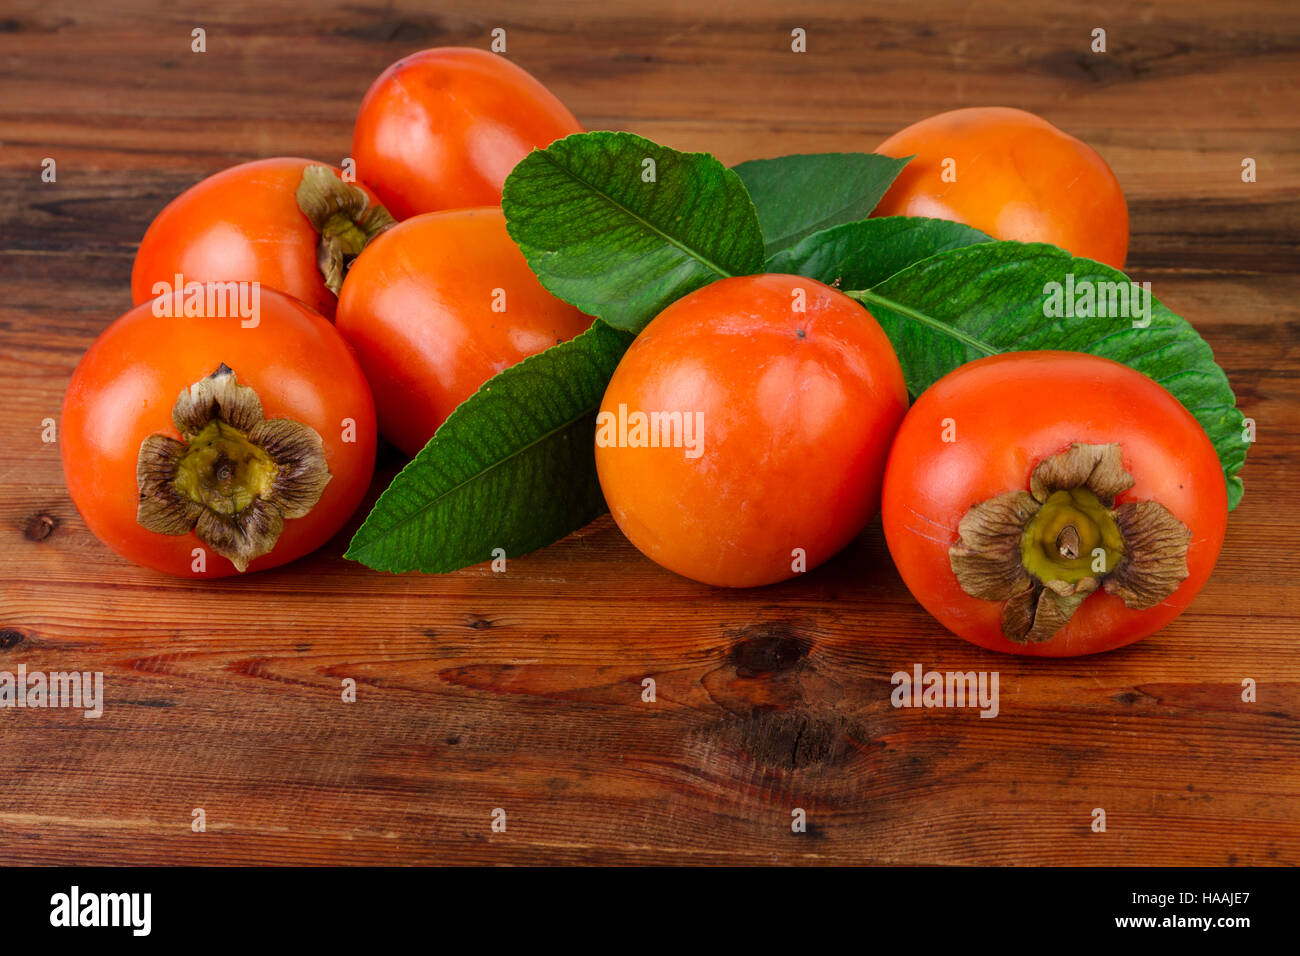 persimmon kaki fruits on wooden table - Stock Image